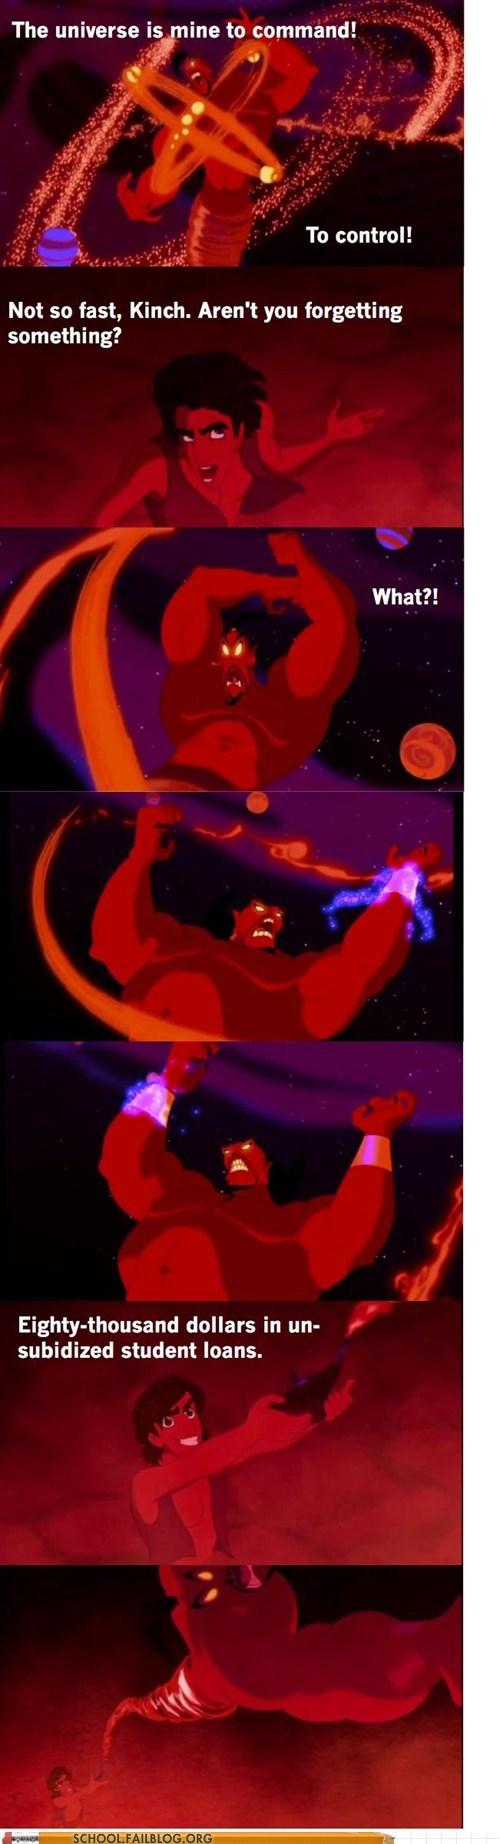 aladdin genie jafar mistake student debt universe - 6508865536